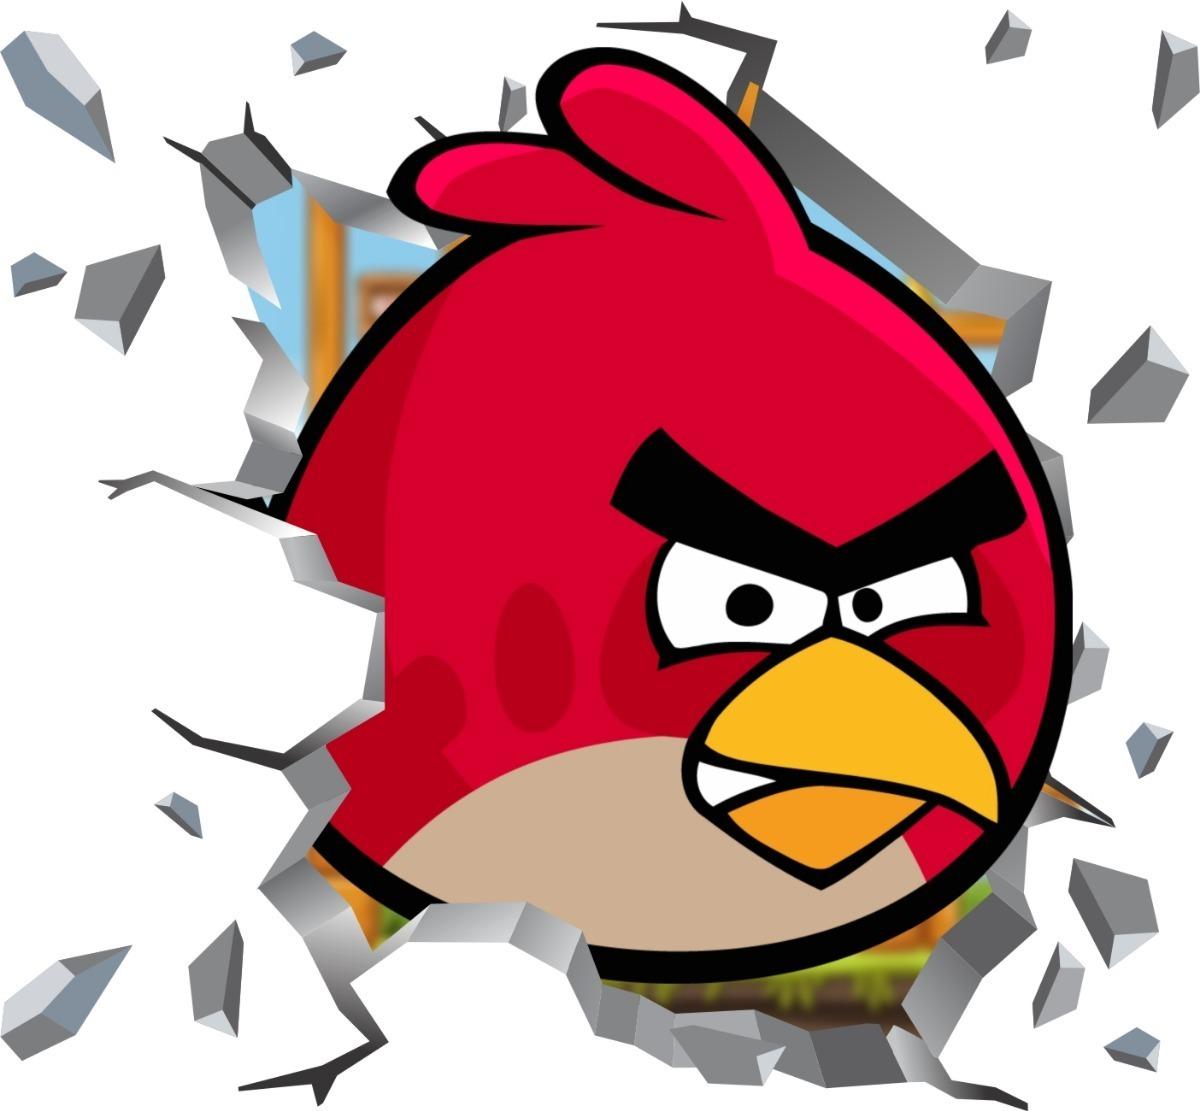 Adesivo 3d Buraco Parede Angry Birds Red Bomba Chuck R 80 60 Em